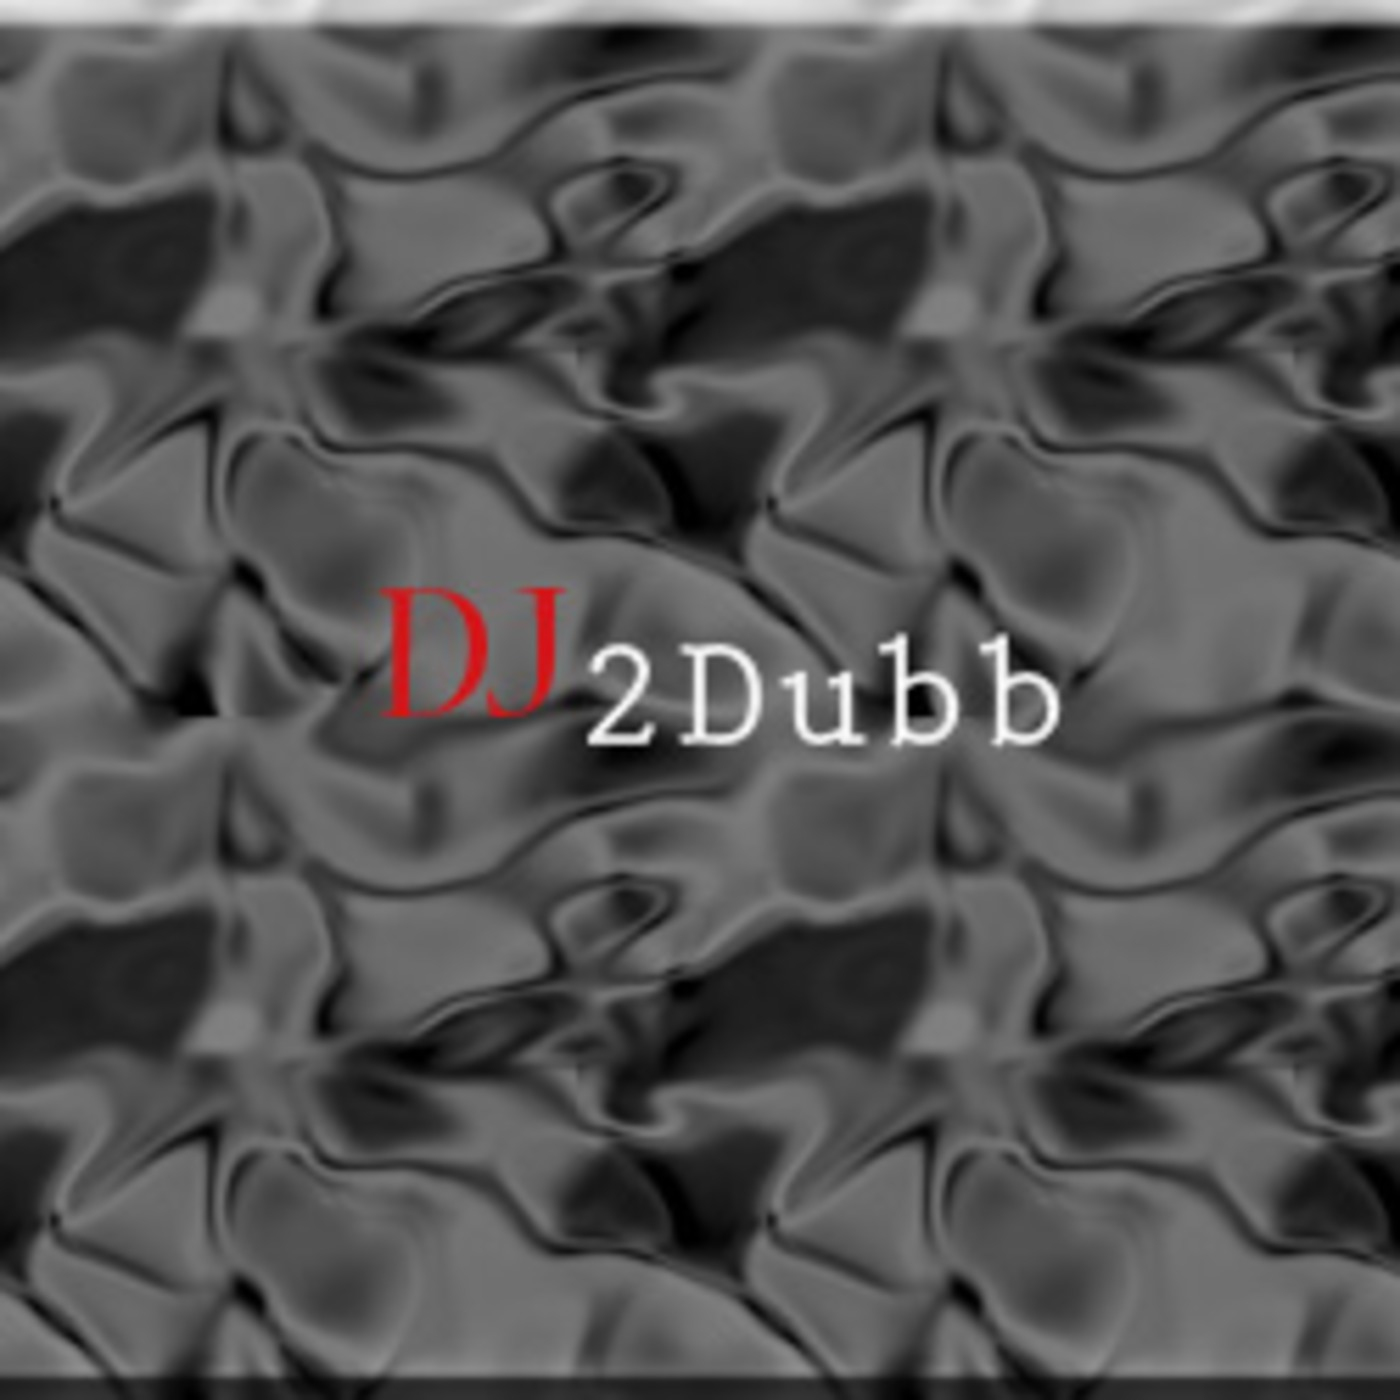 2Dubb